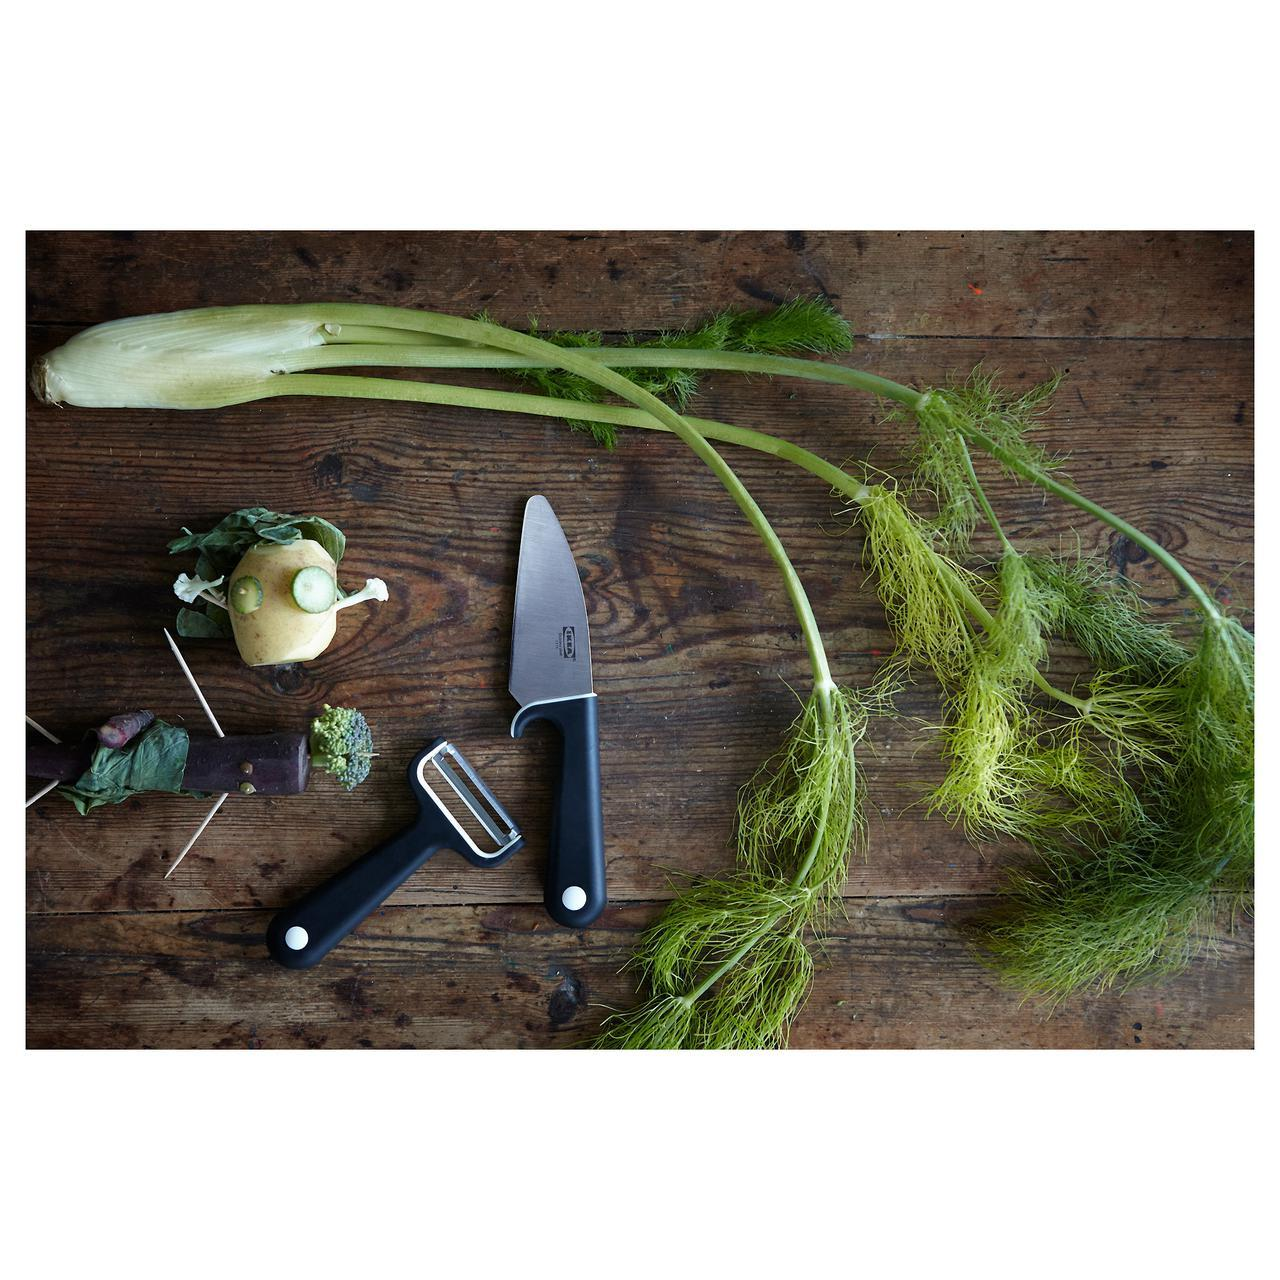 Детский нож и овощечистка SMABIT